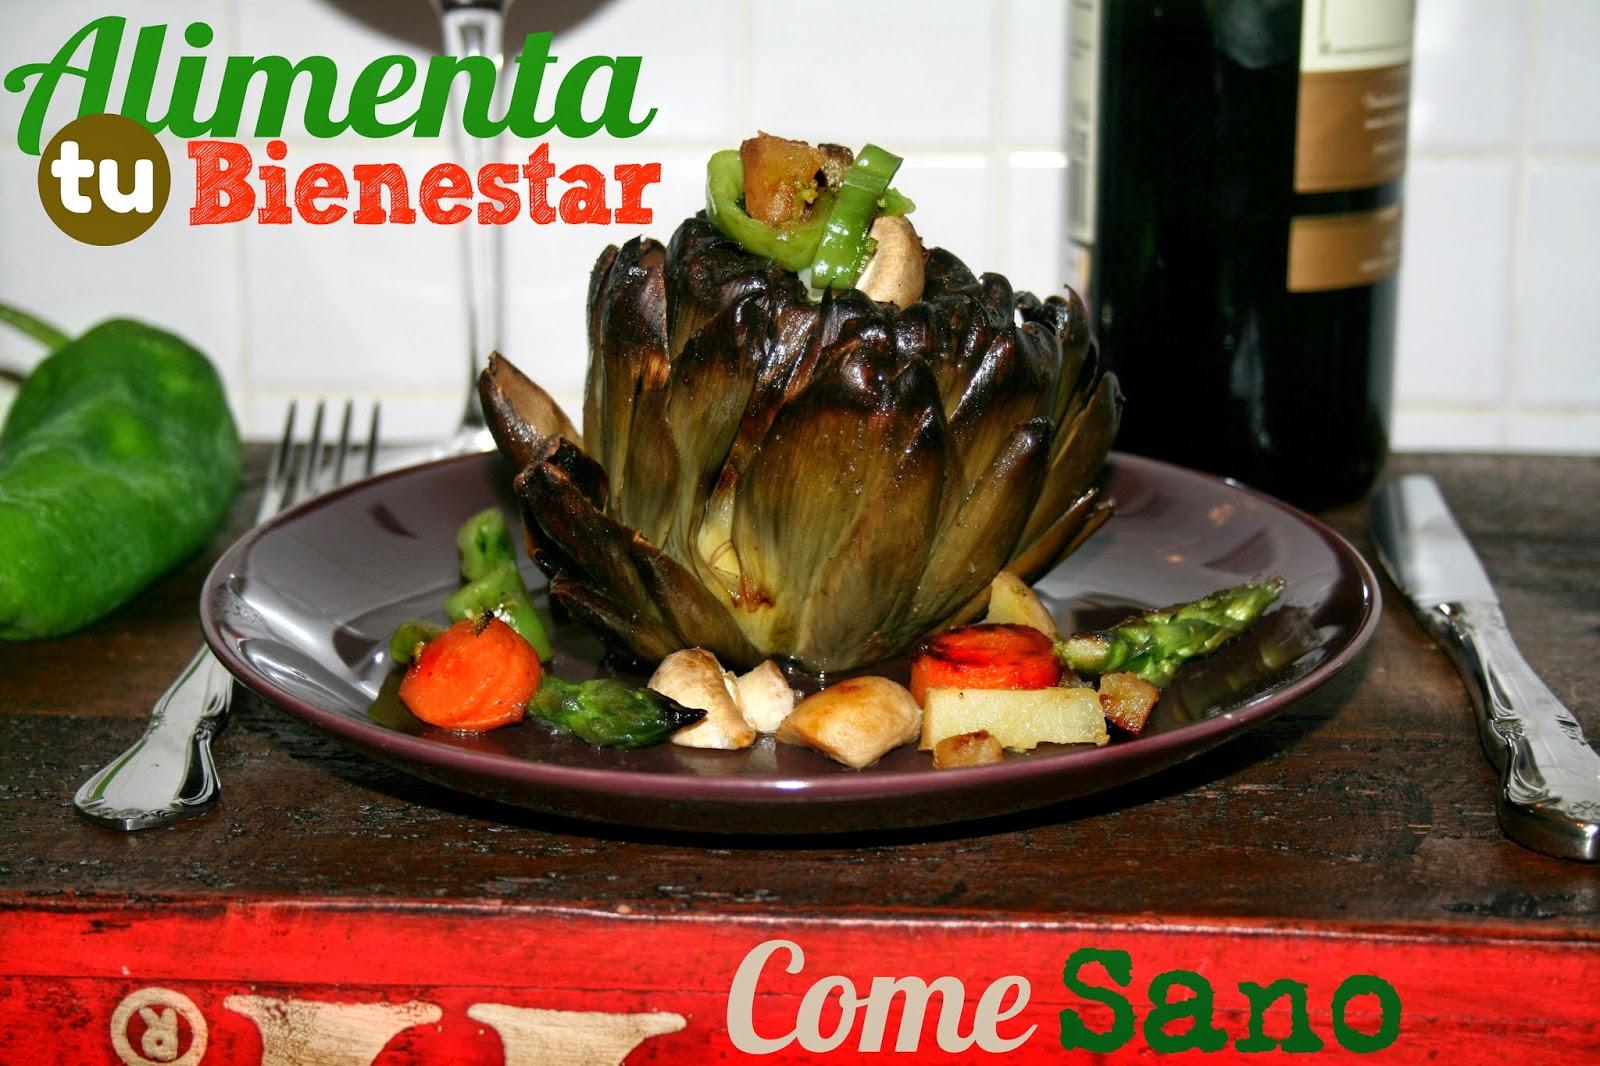 alcachofas, receta alcachofas, como hacer alcachofas, recetas sanas, recetas originales, recetas caseras, recetas de cocina, receta con verduras, alcachofas con verduras, recetas saludables, blog cocina, yummy recipes